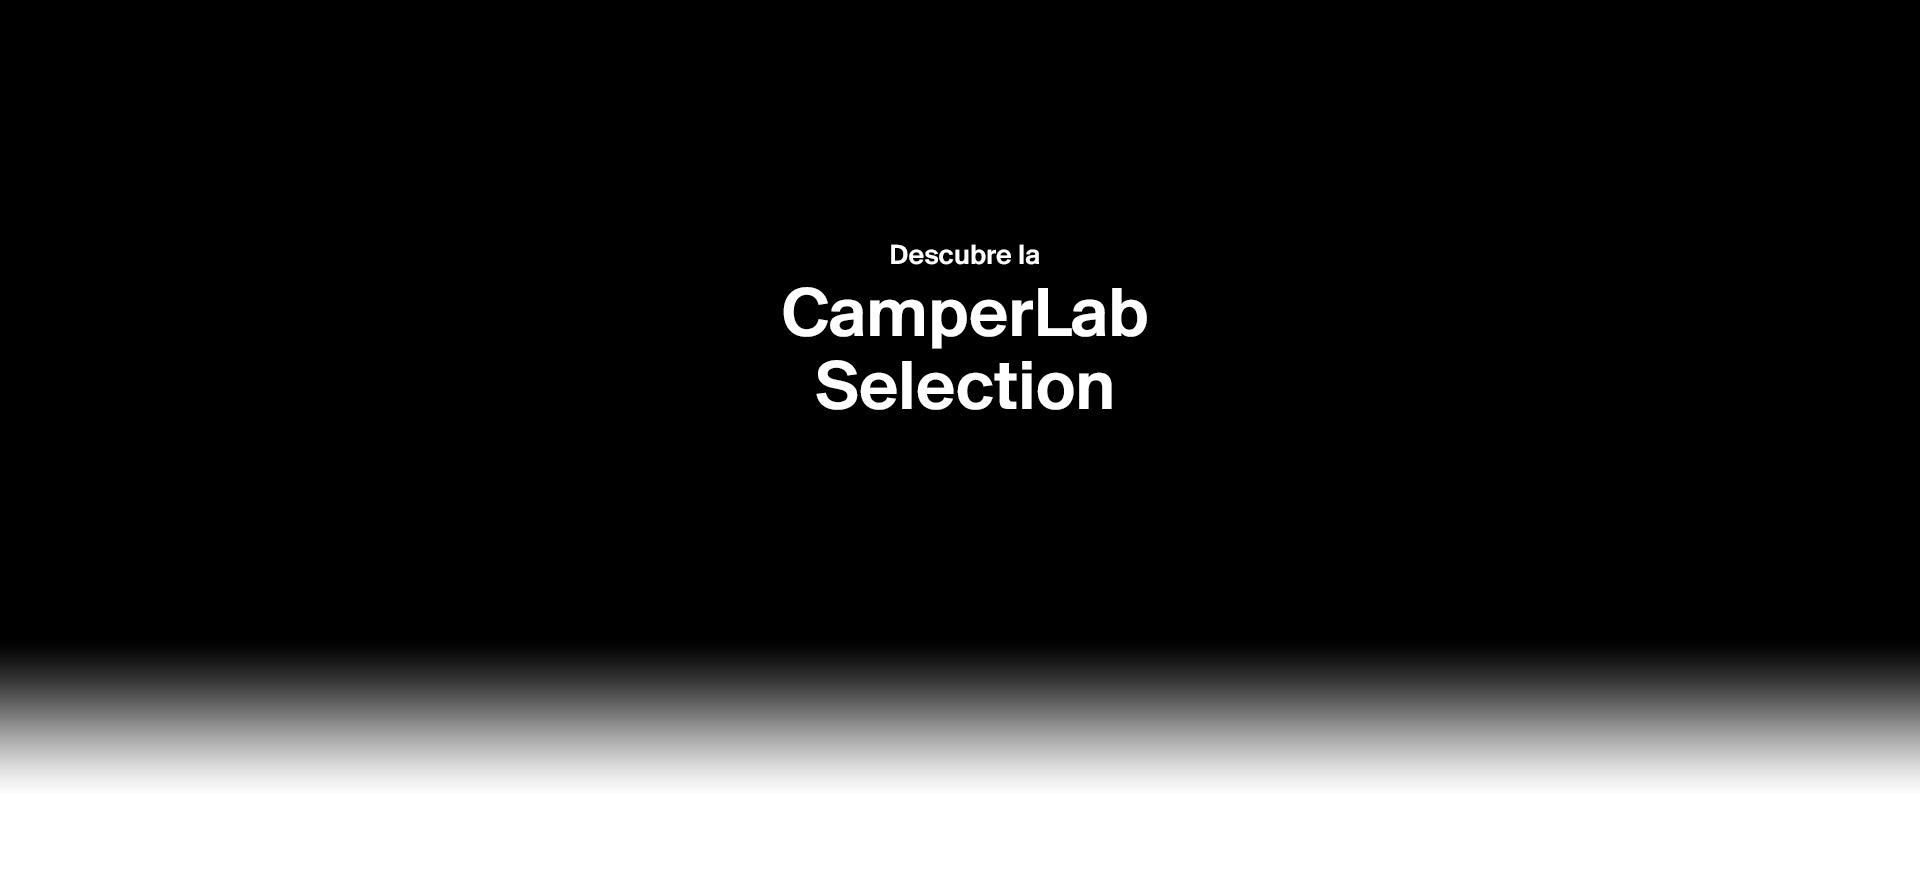 Camper lab